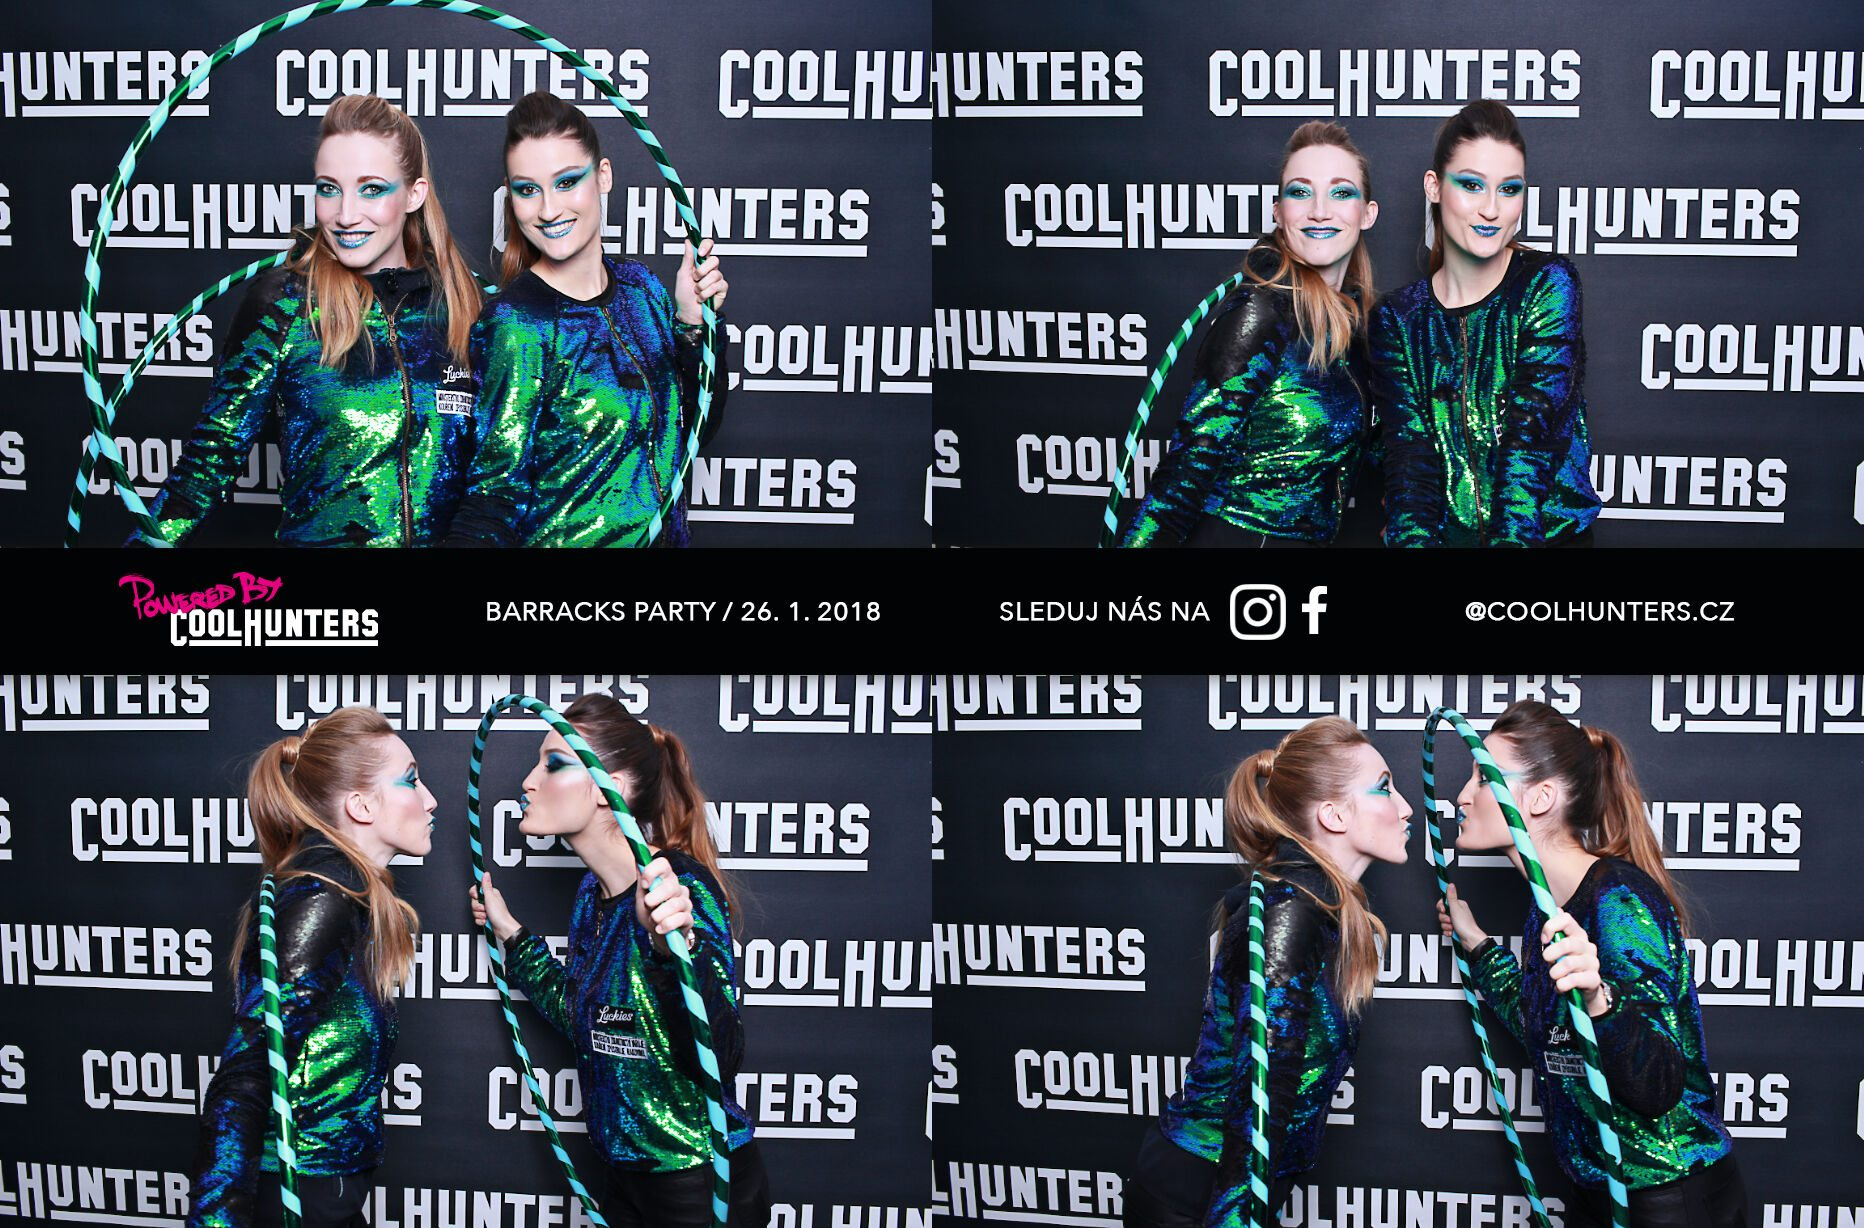 fotokoutek-coolhunters-barracks-party-26-1-2018-386060